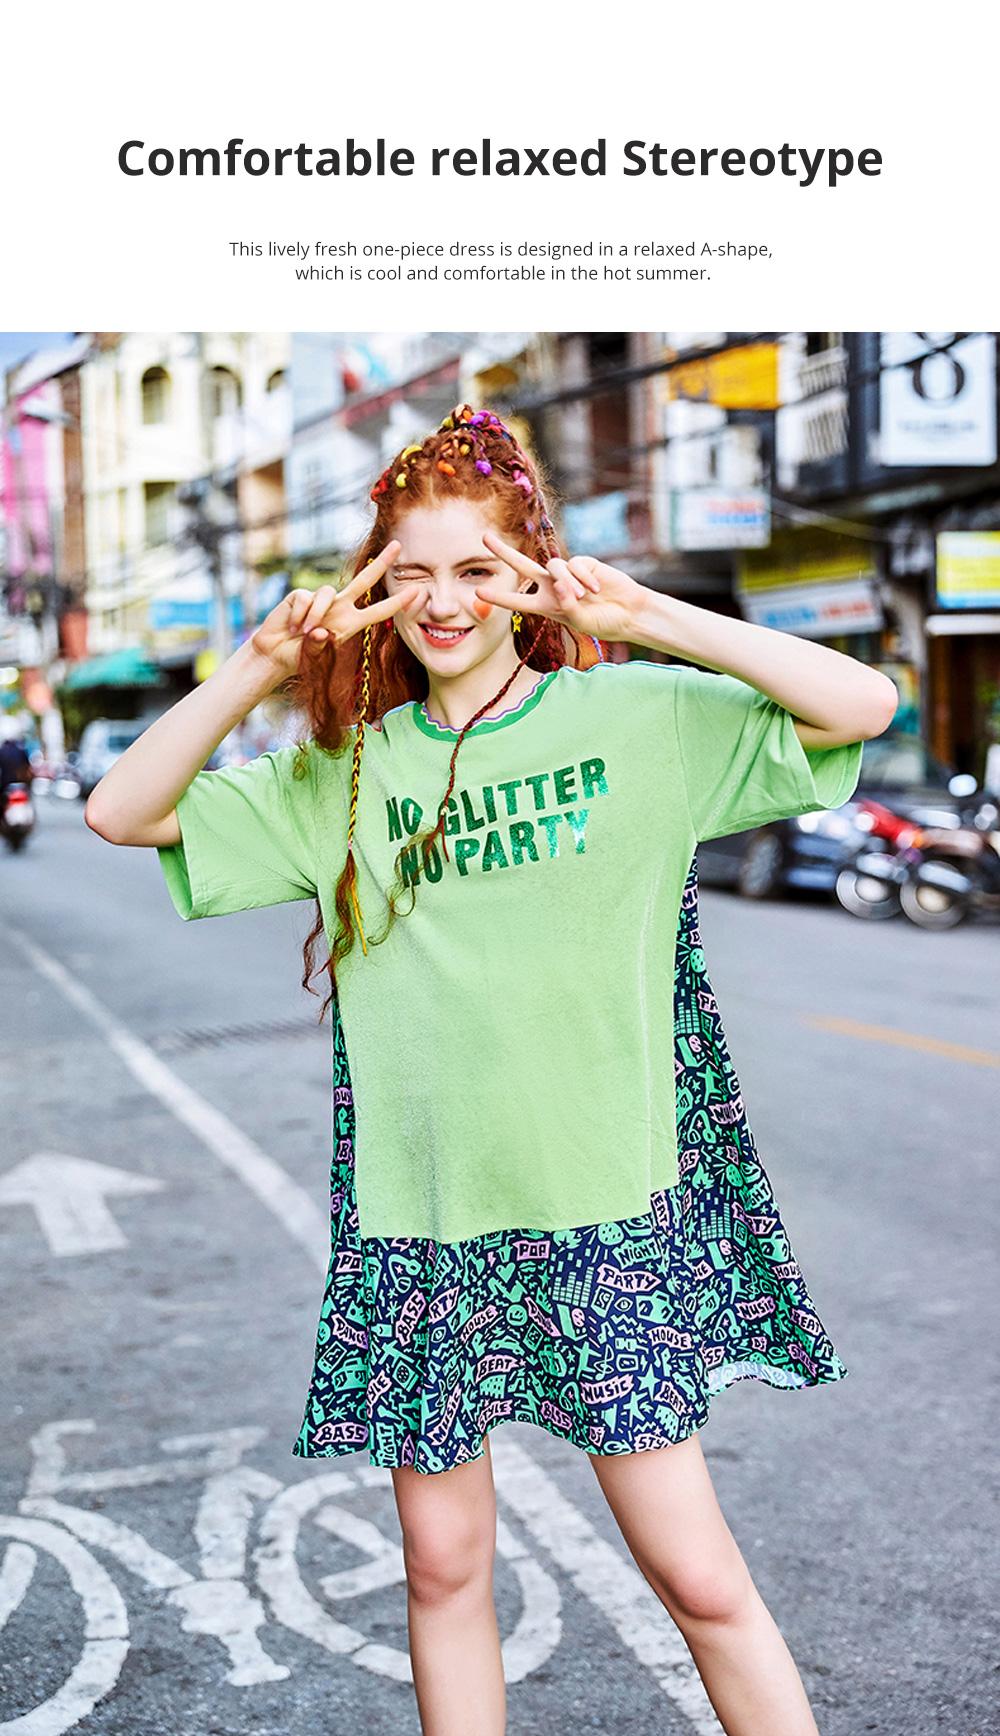 Summer New European Style Fashionable Avocado Green One-piece Fresh Leisure A-shape Dress For Girls Womens 1